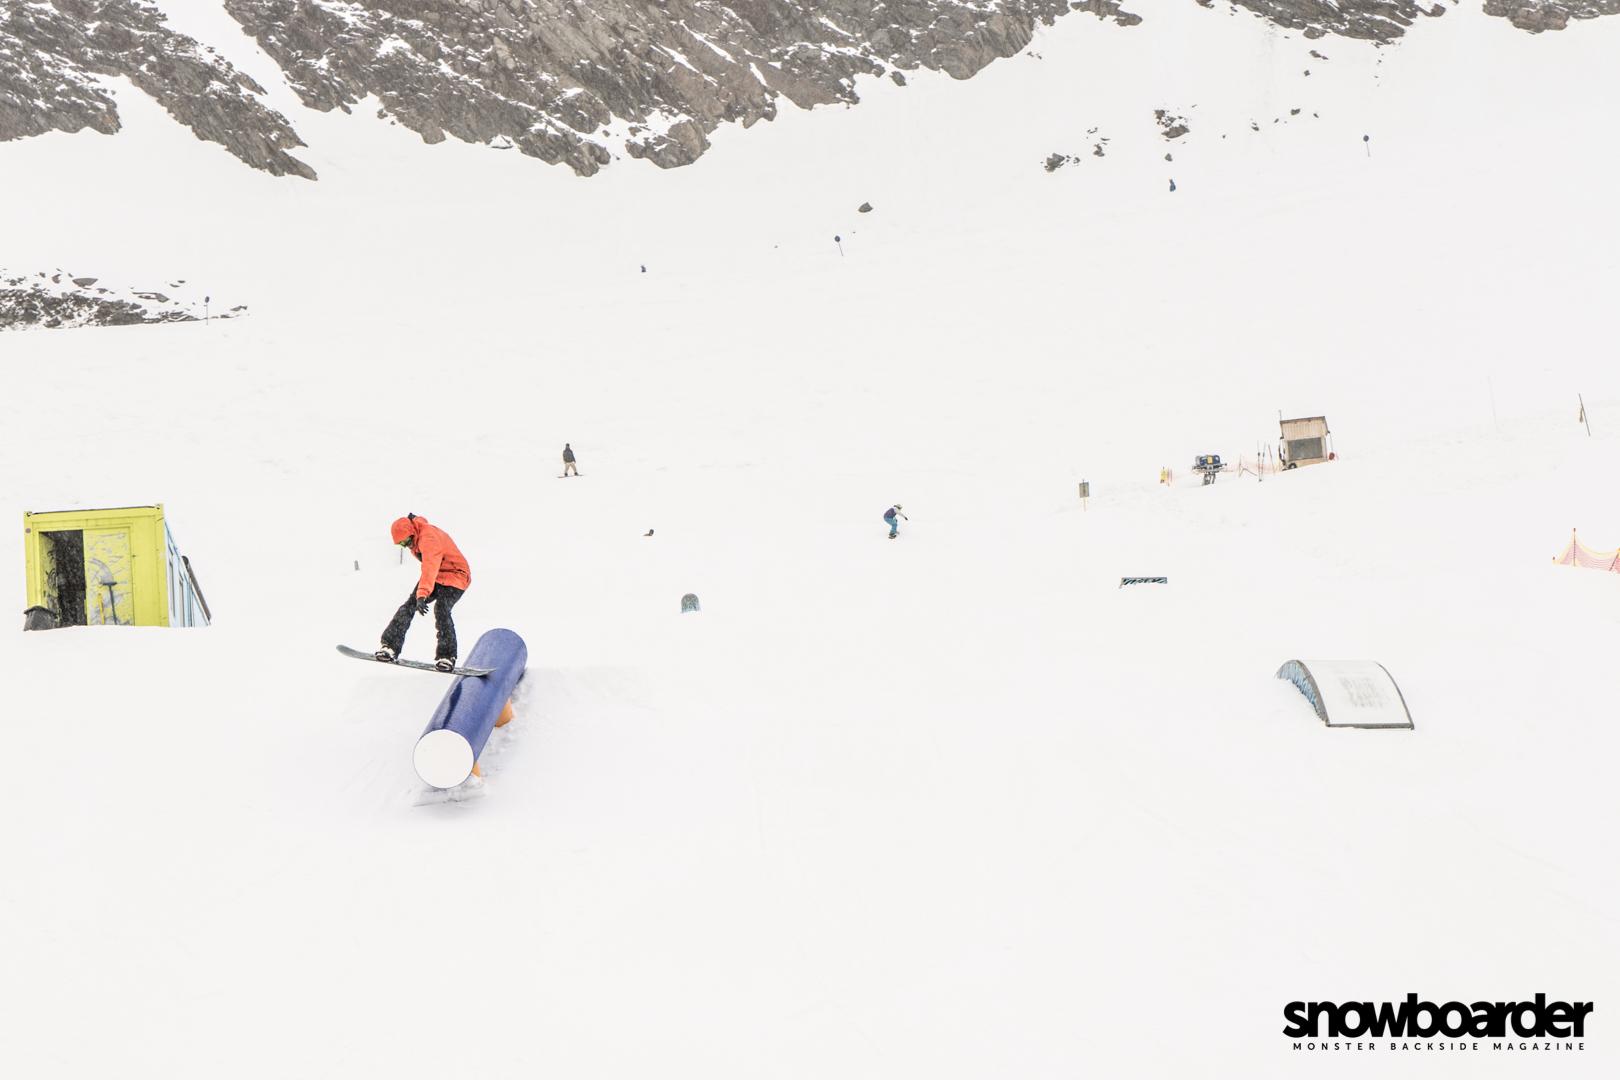 snowboardermbm-3